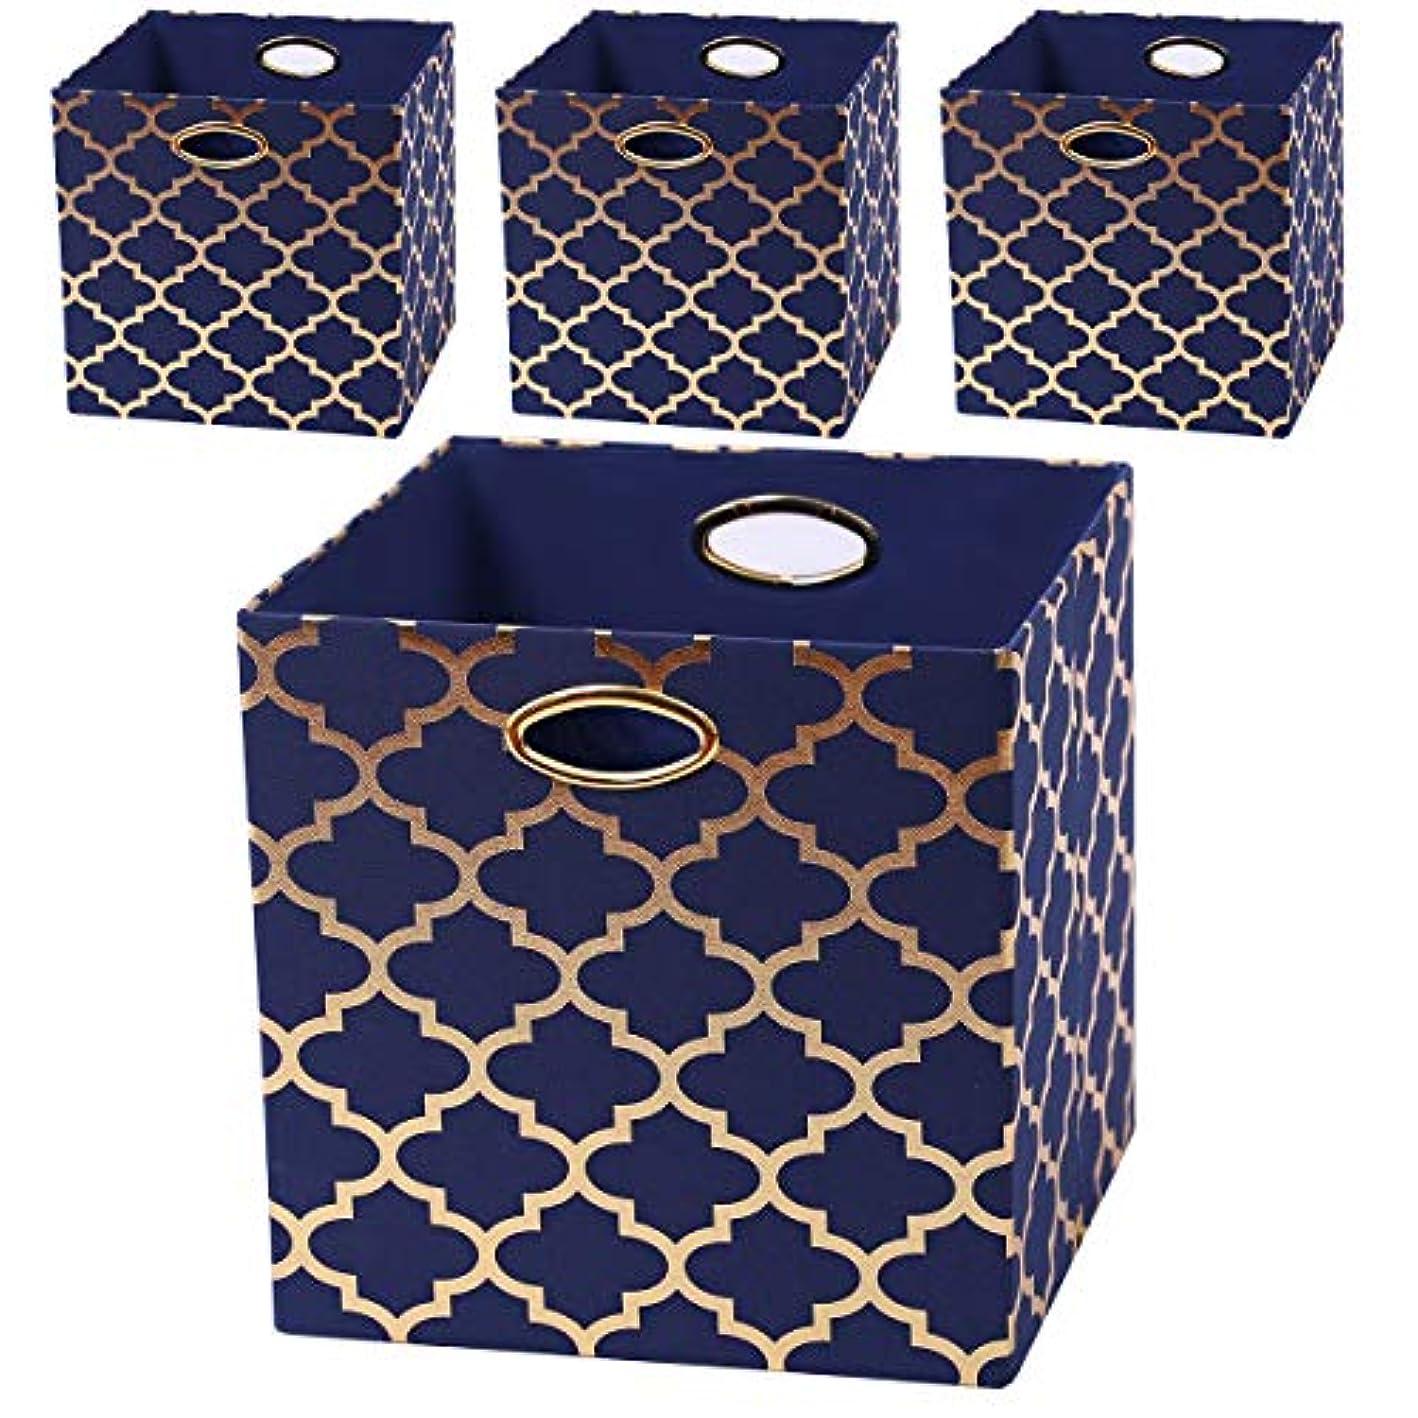 Posprica Storage Bins, 13×13 Storage Cubes Baskets Boxes Containers (4pcs, Navy/Gold Lantern)